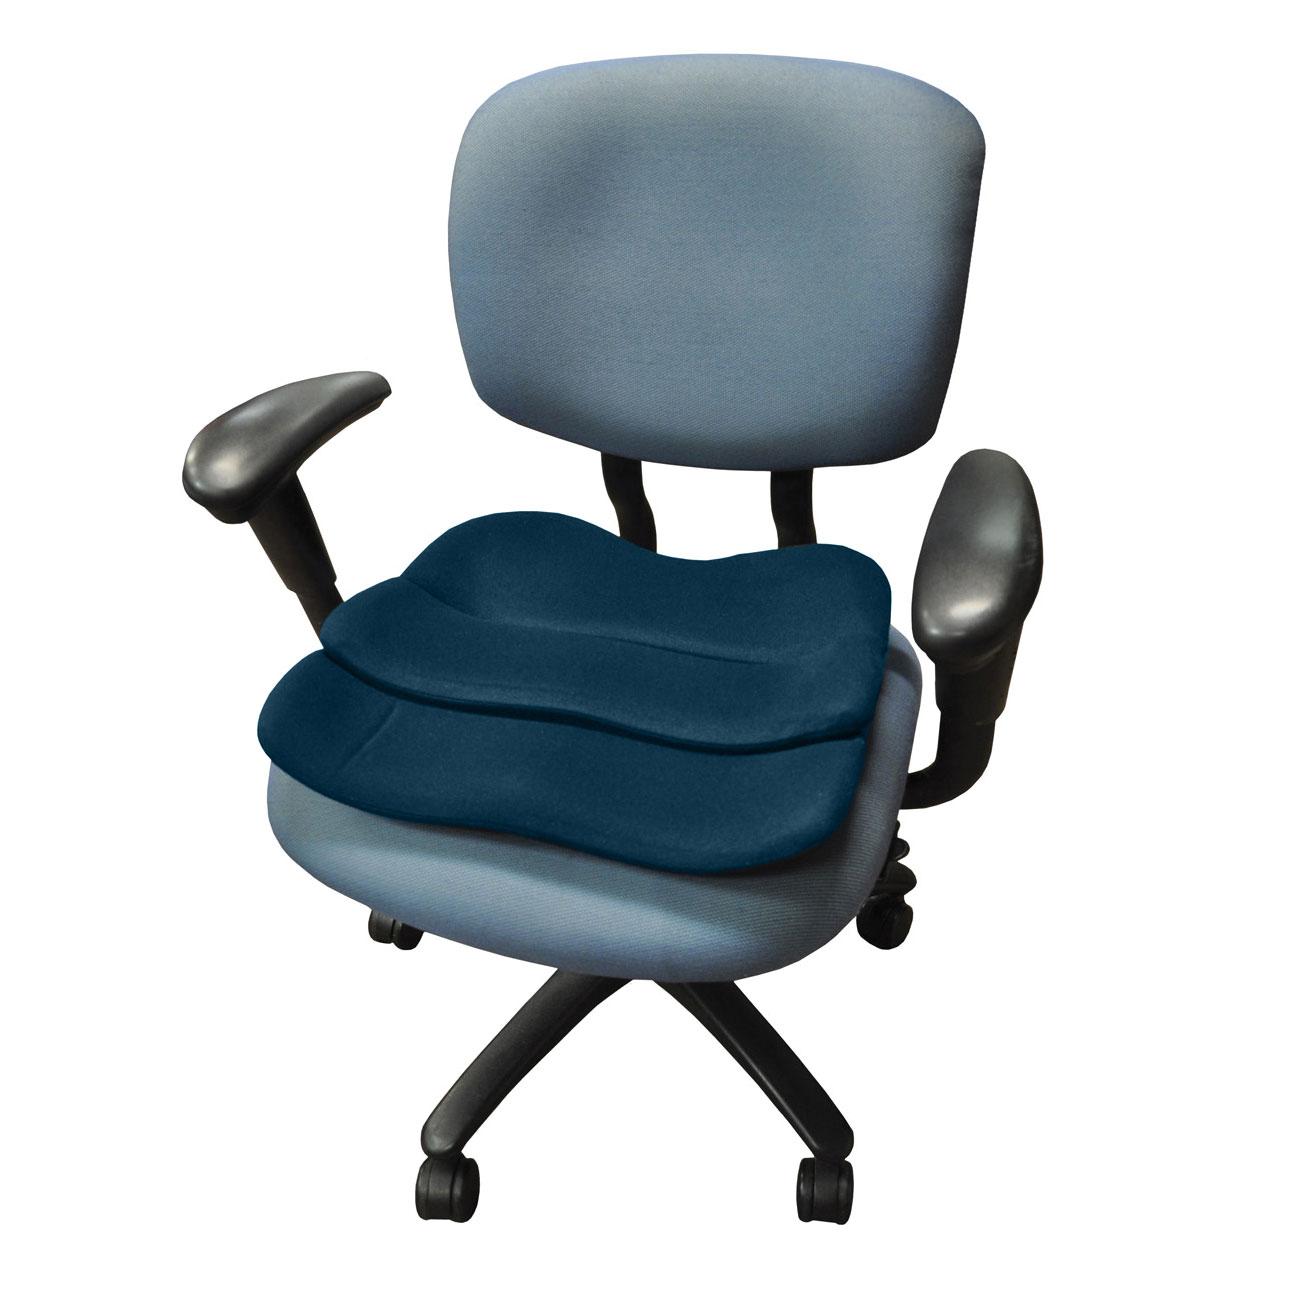 ObusForme Contoured Seat Cushion - Navy